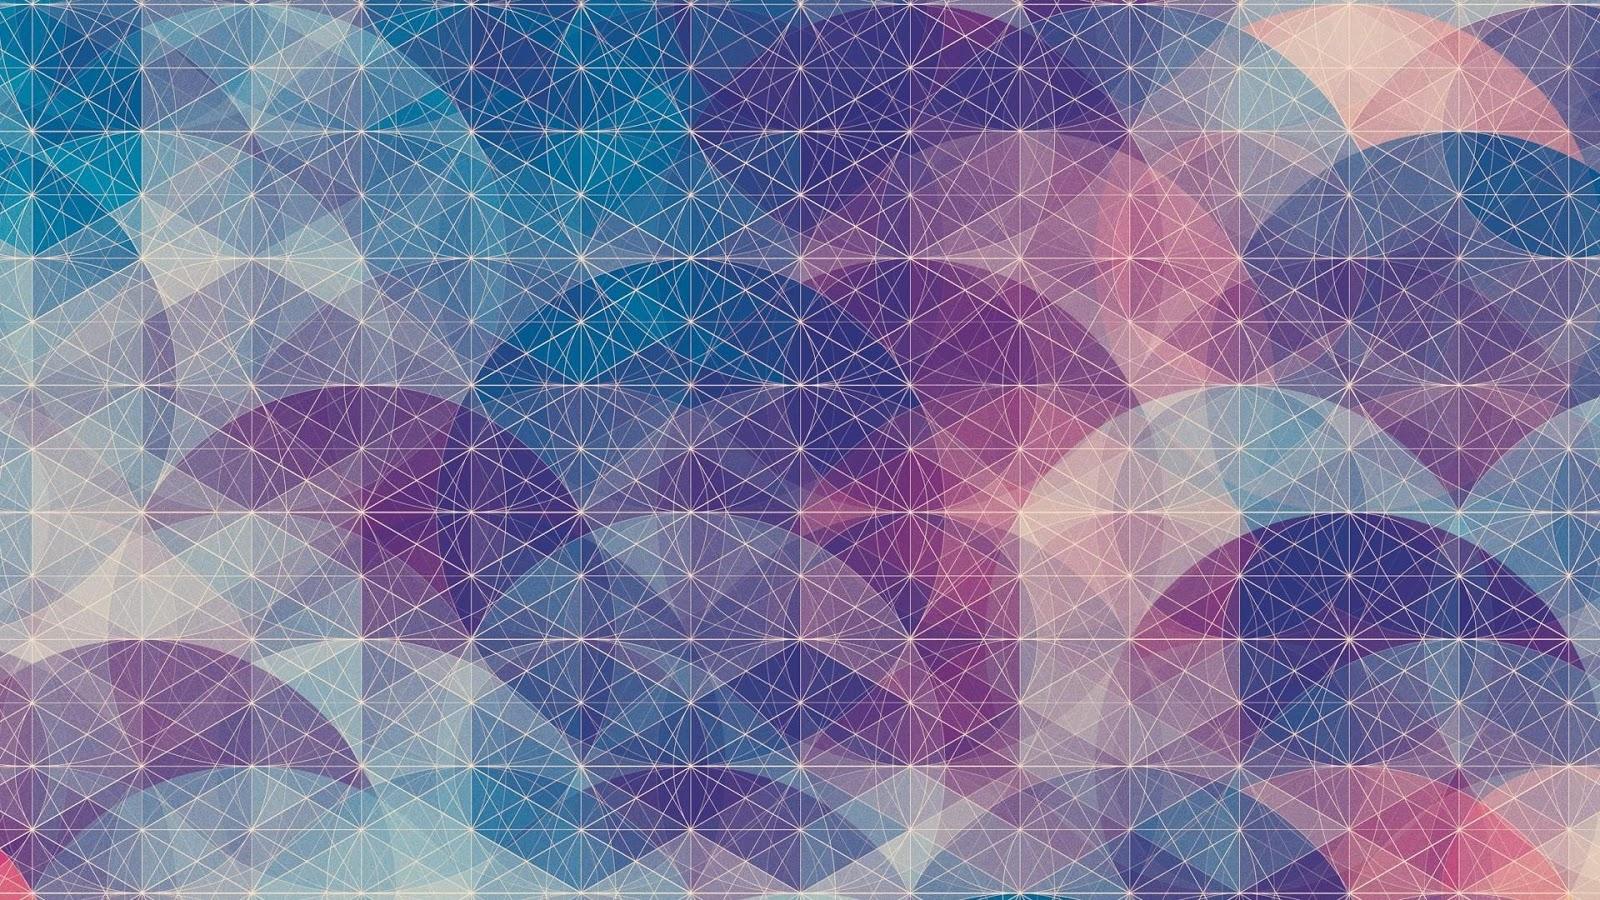 Geometric Animal Wallpaper 74 Images: Geometric Animal Wallpaper